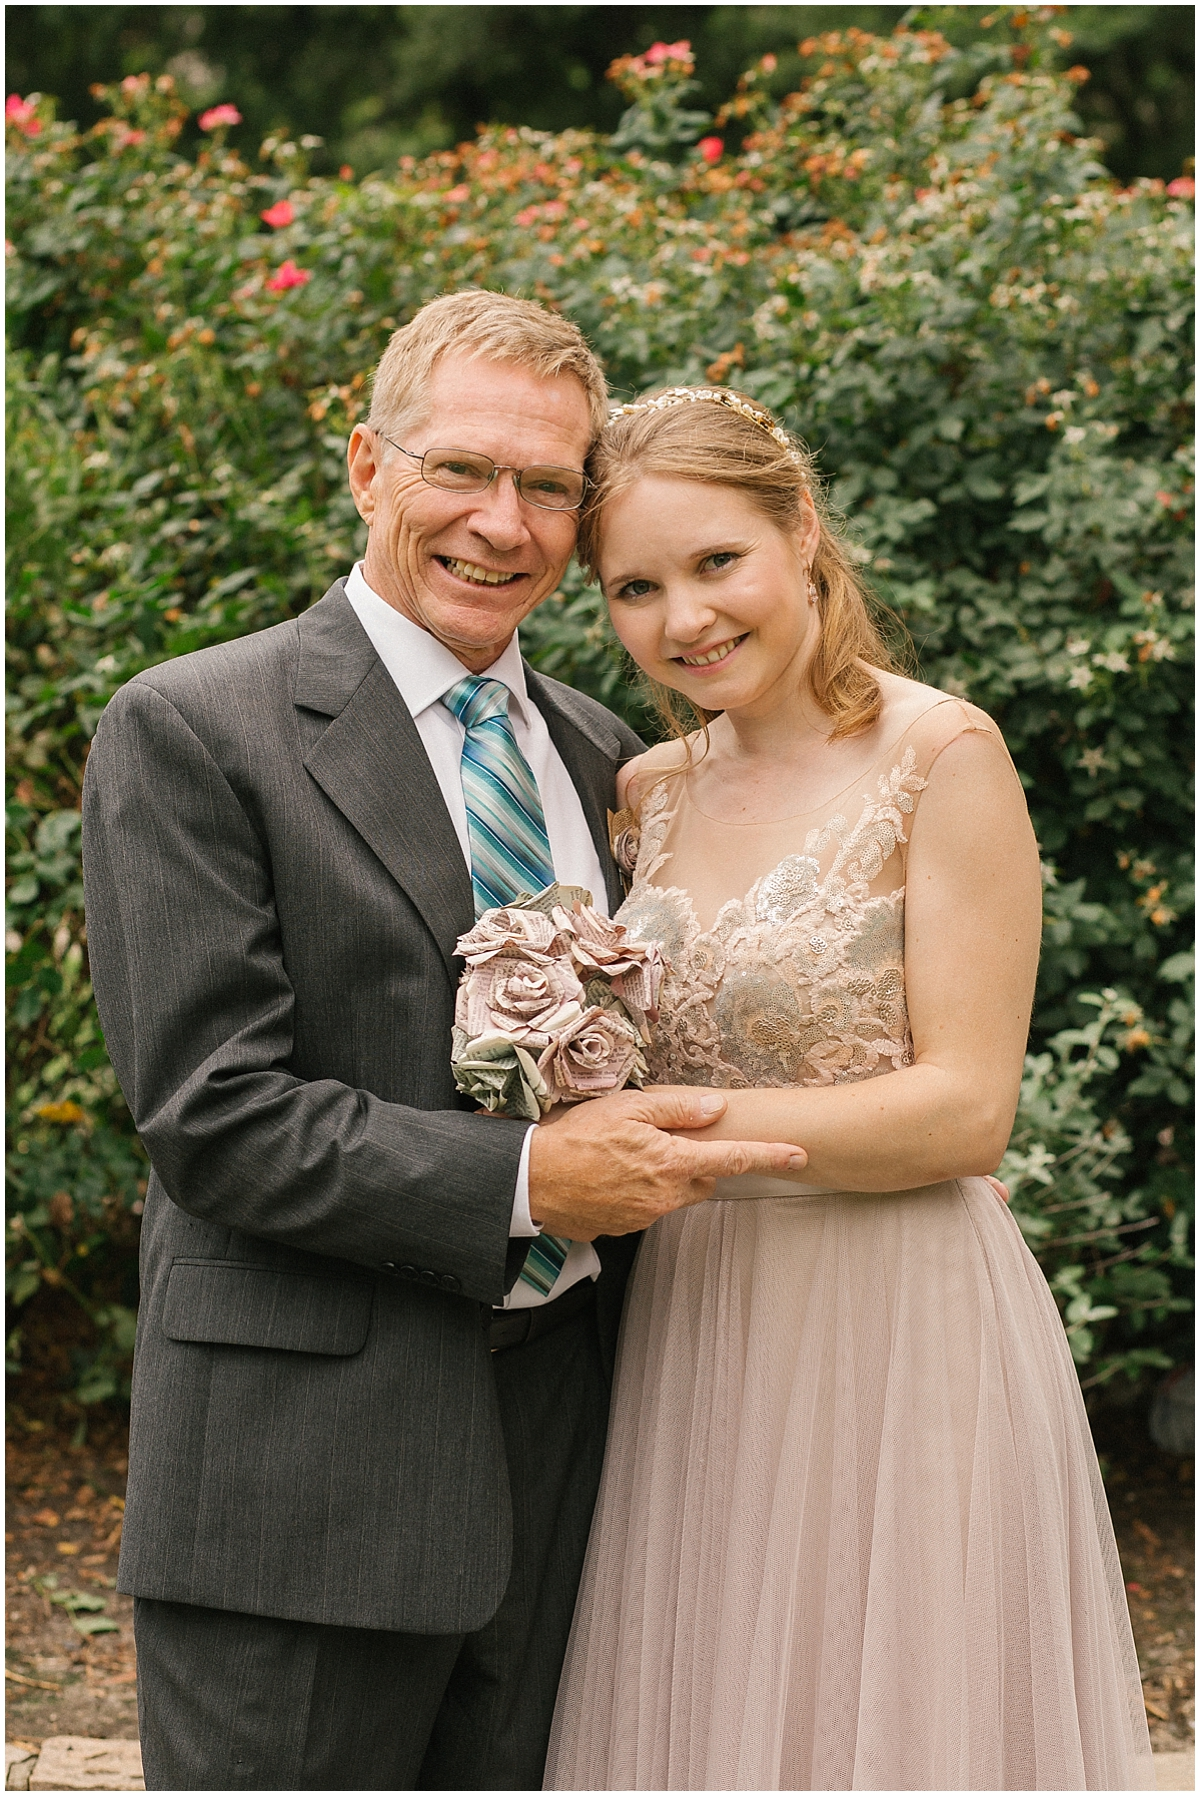 North_Carolina_wedding_photographer__0164.jpg